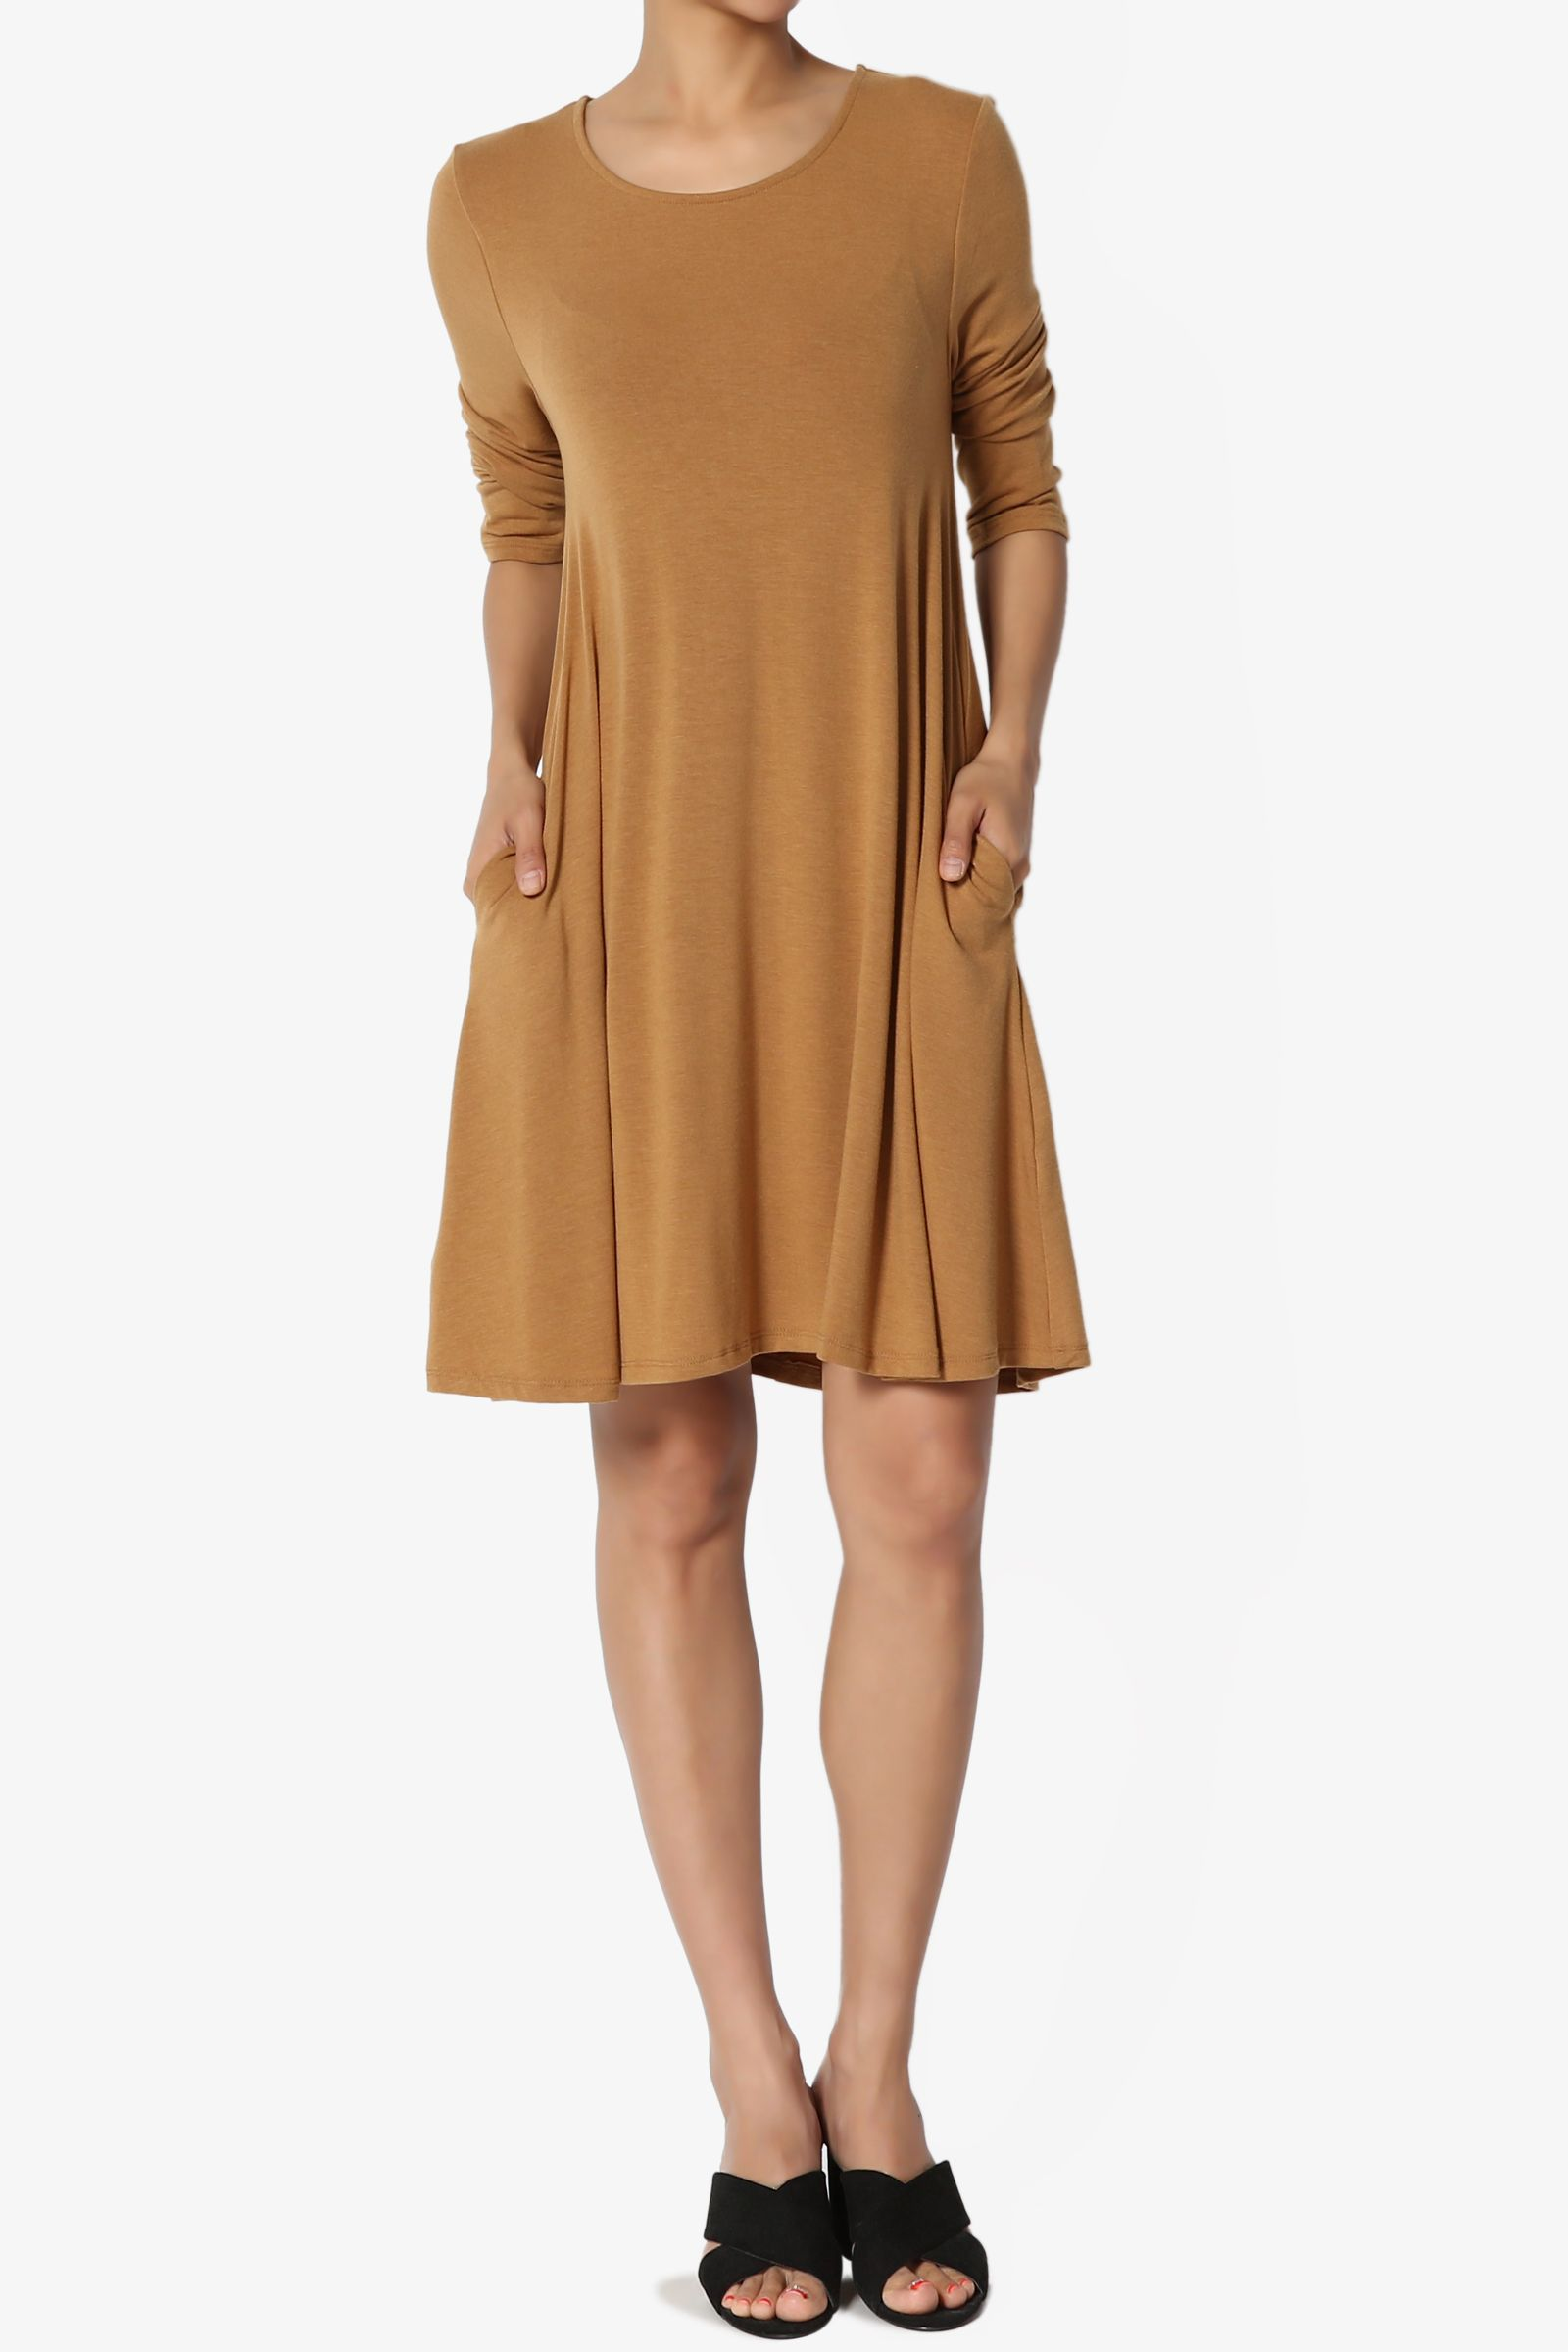 f864a0c94fe TheMogan Women s S~3XL Basic 3 4 Sleeve Swing Flared Tunic Dress Pocket  Long Top Basic